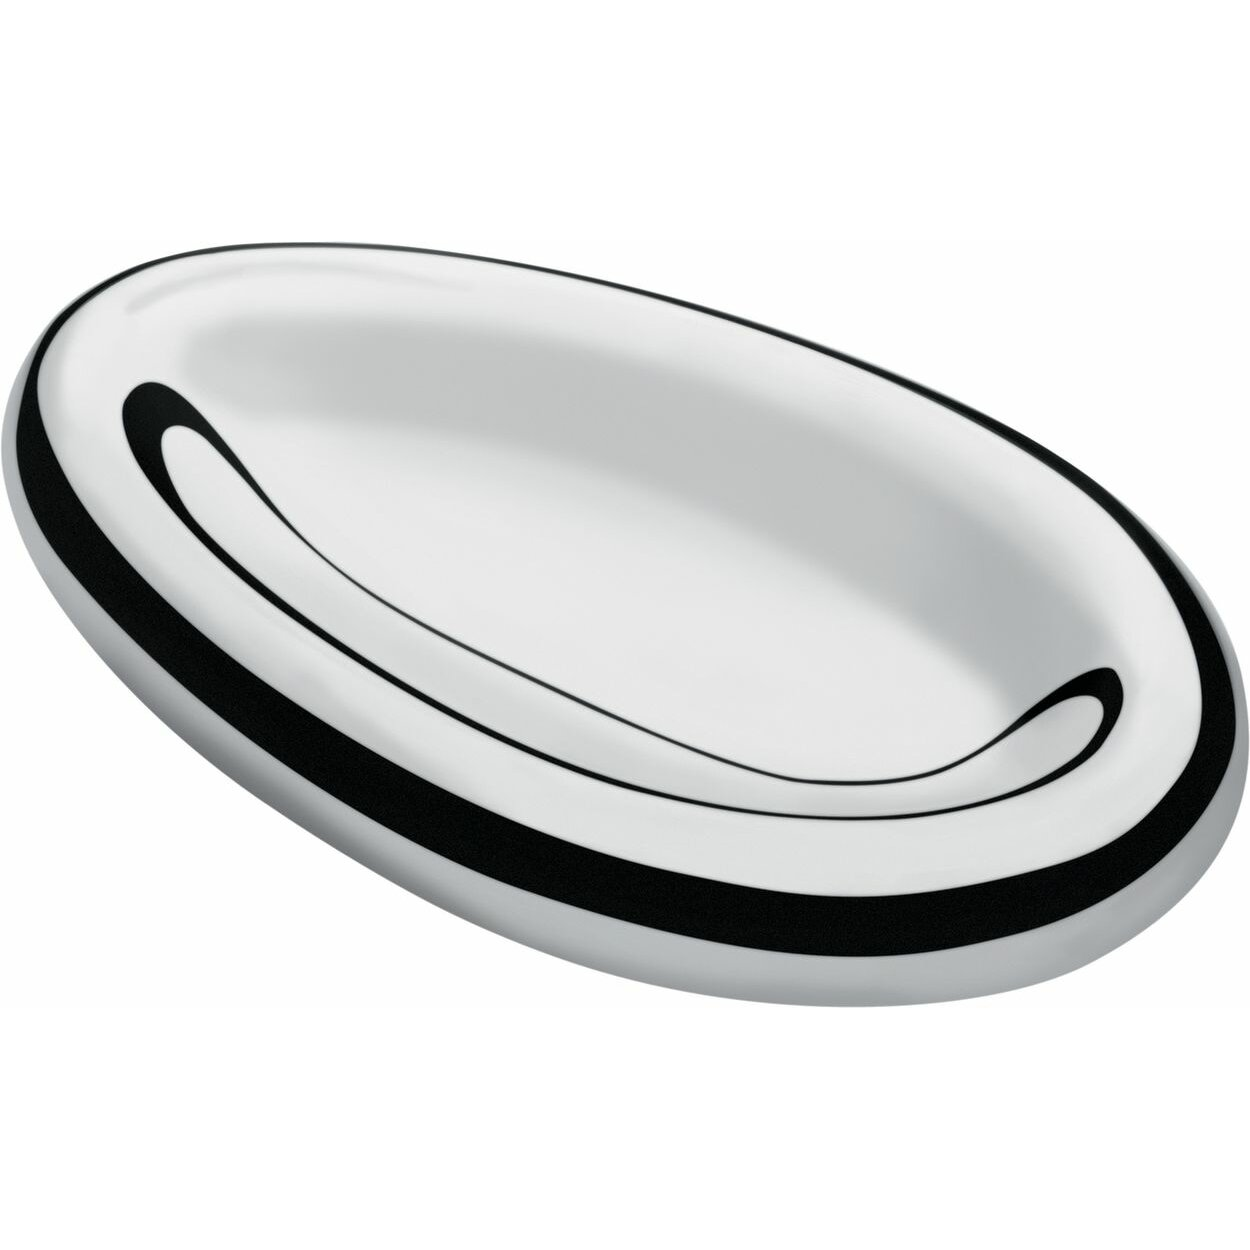 big shoom centrepiece decorative bowl - Decorative Bowl